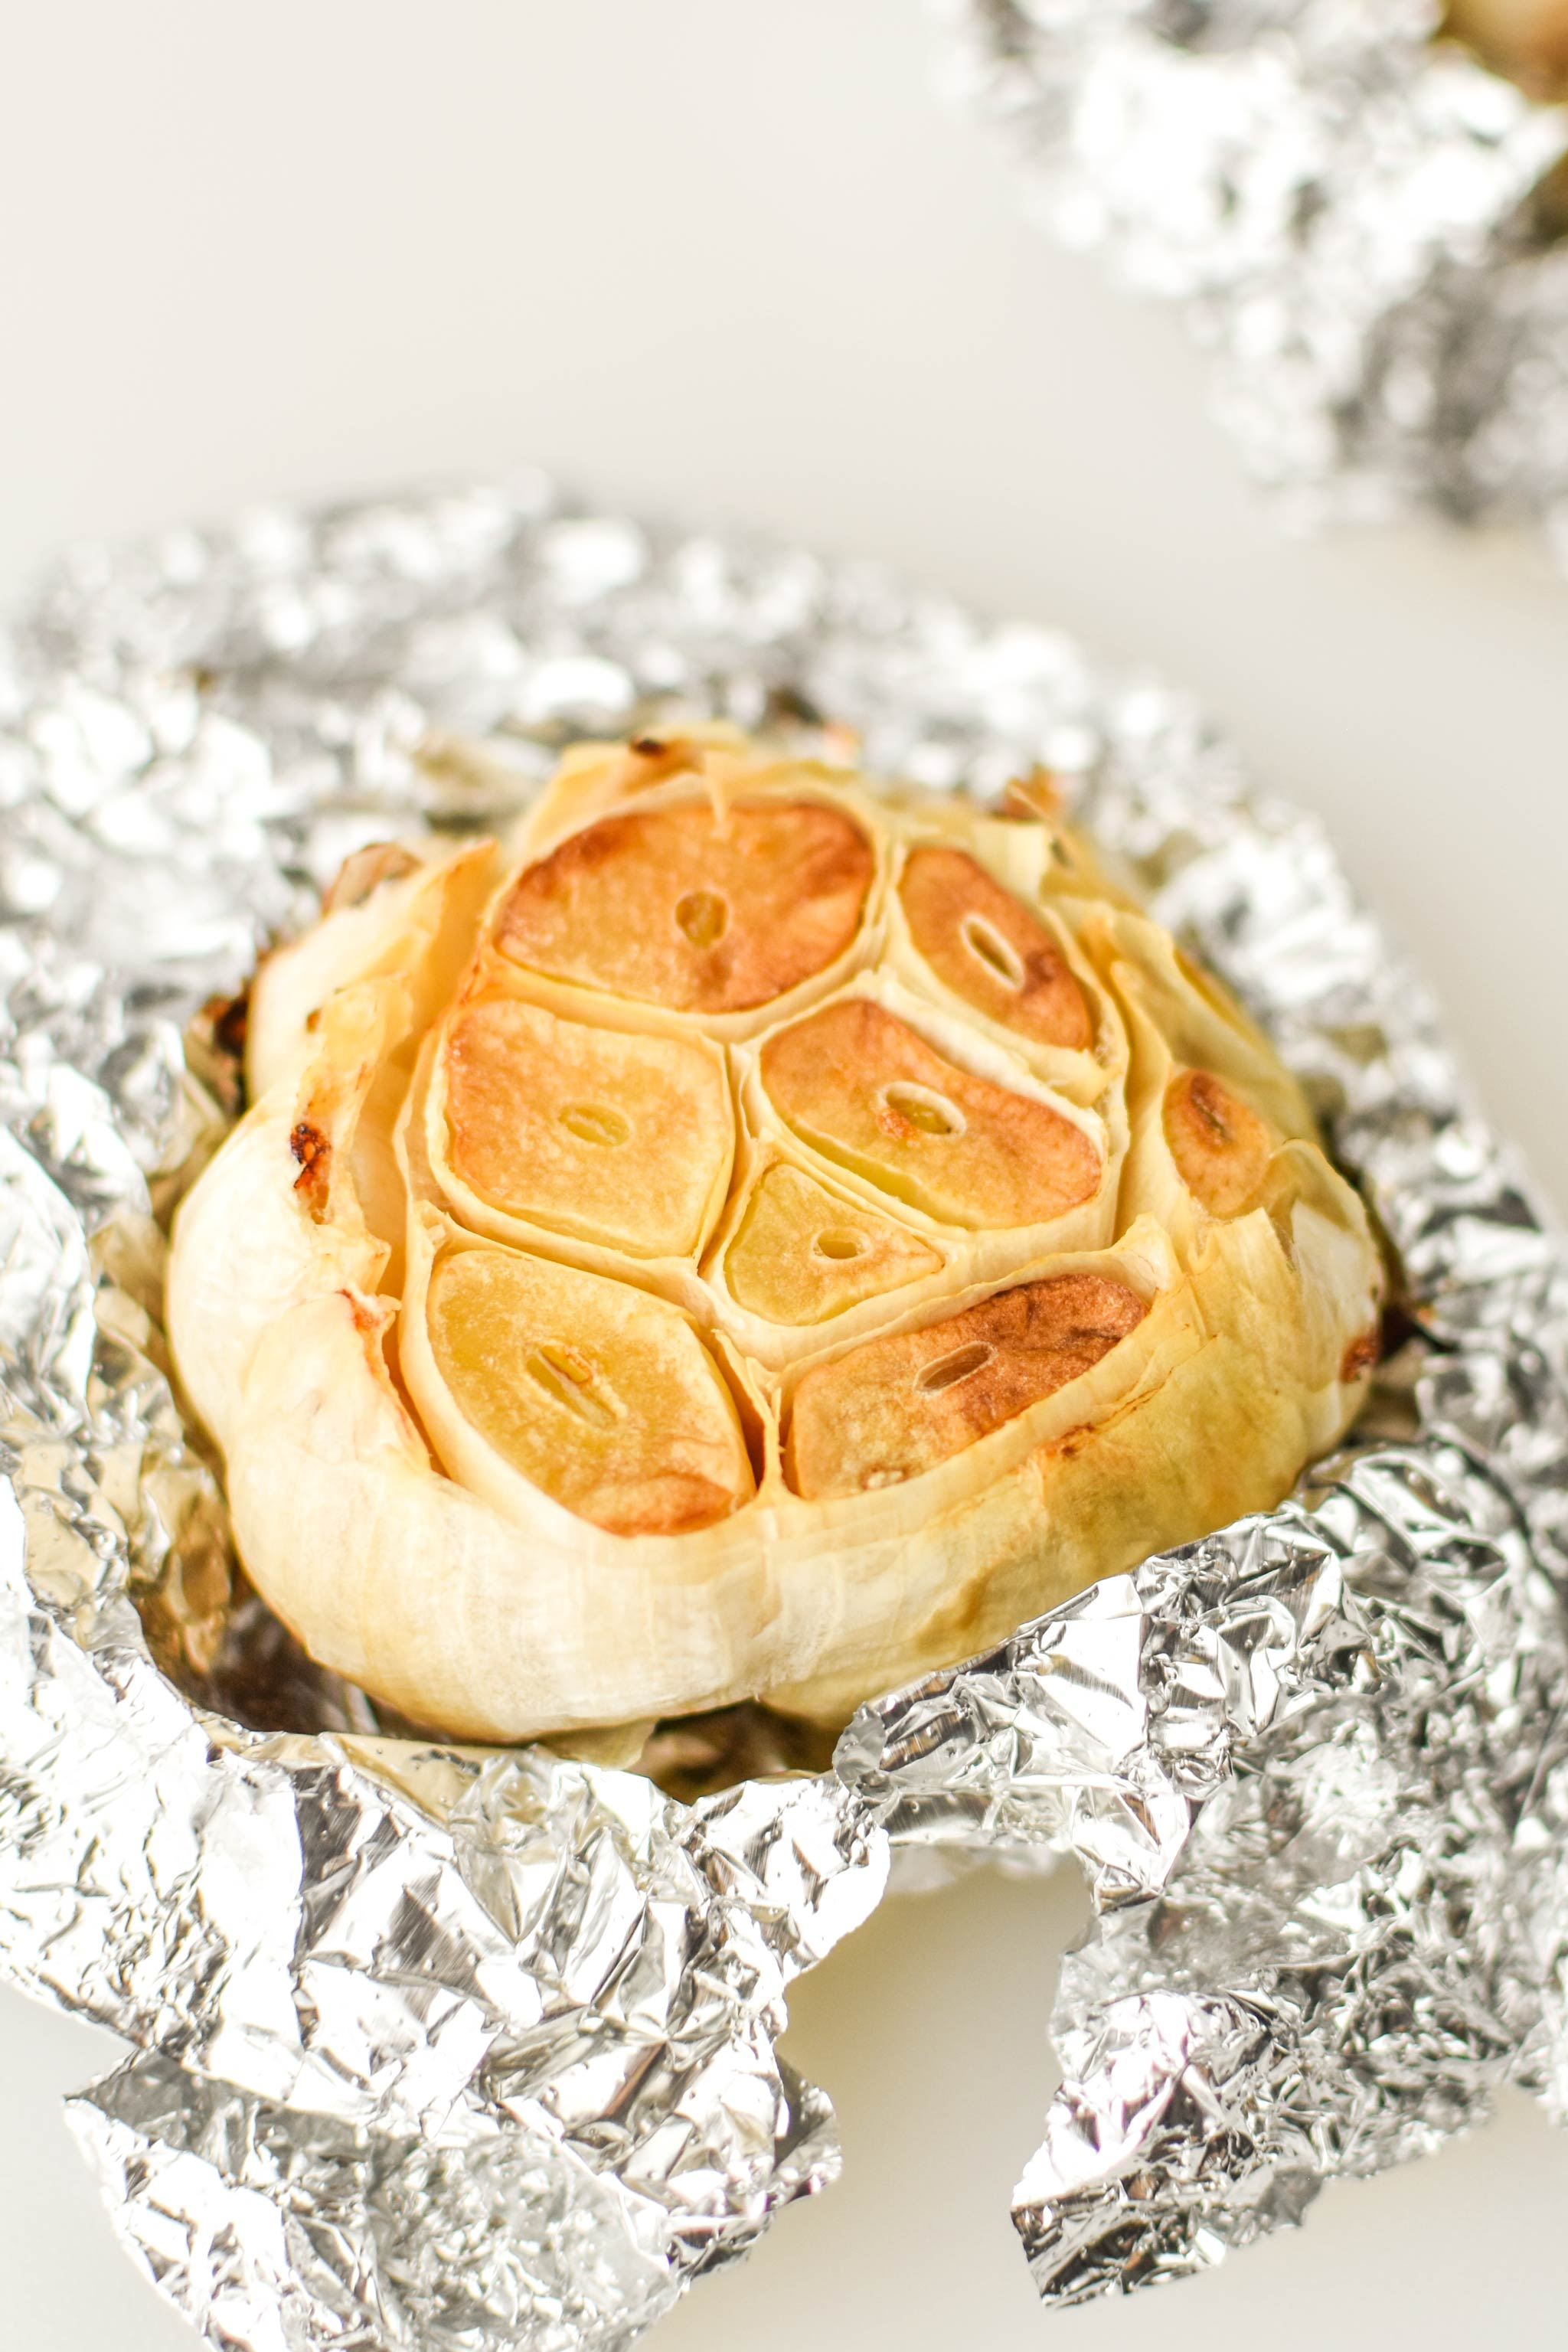 A head of garlic freshly roasted in the air fryer.